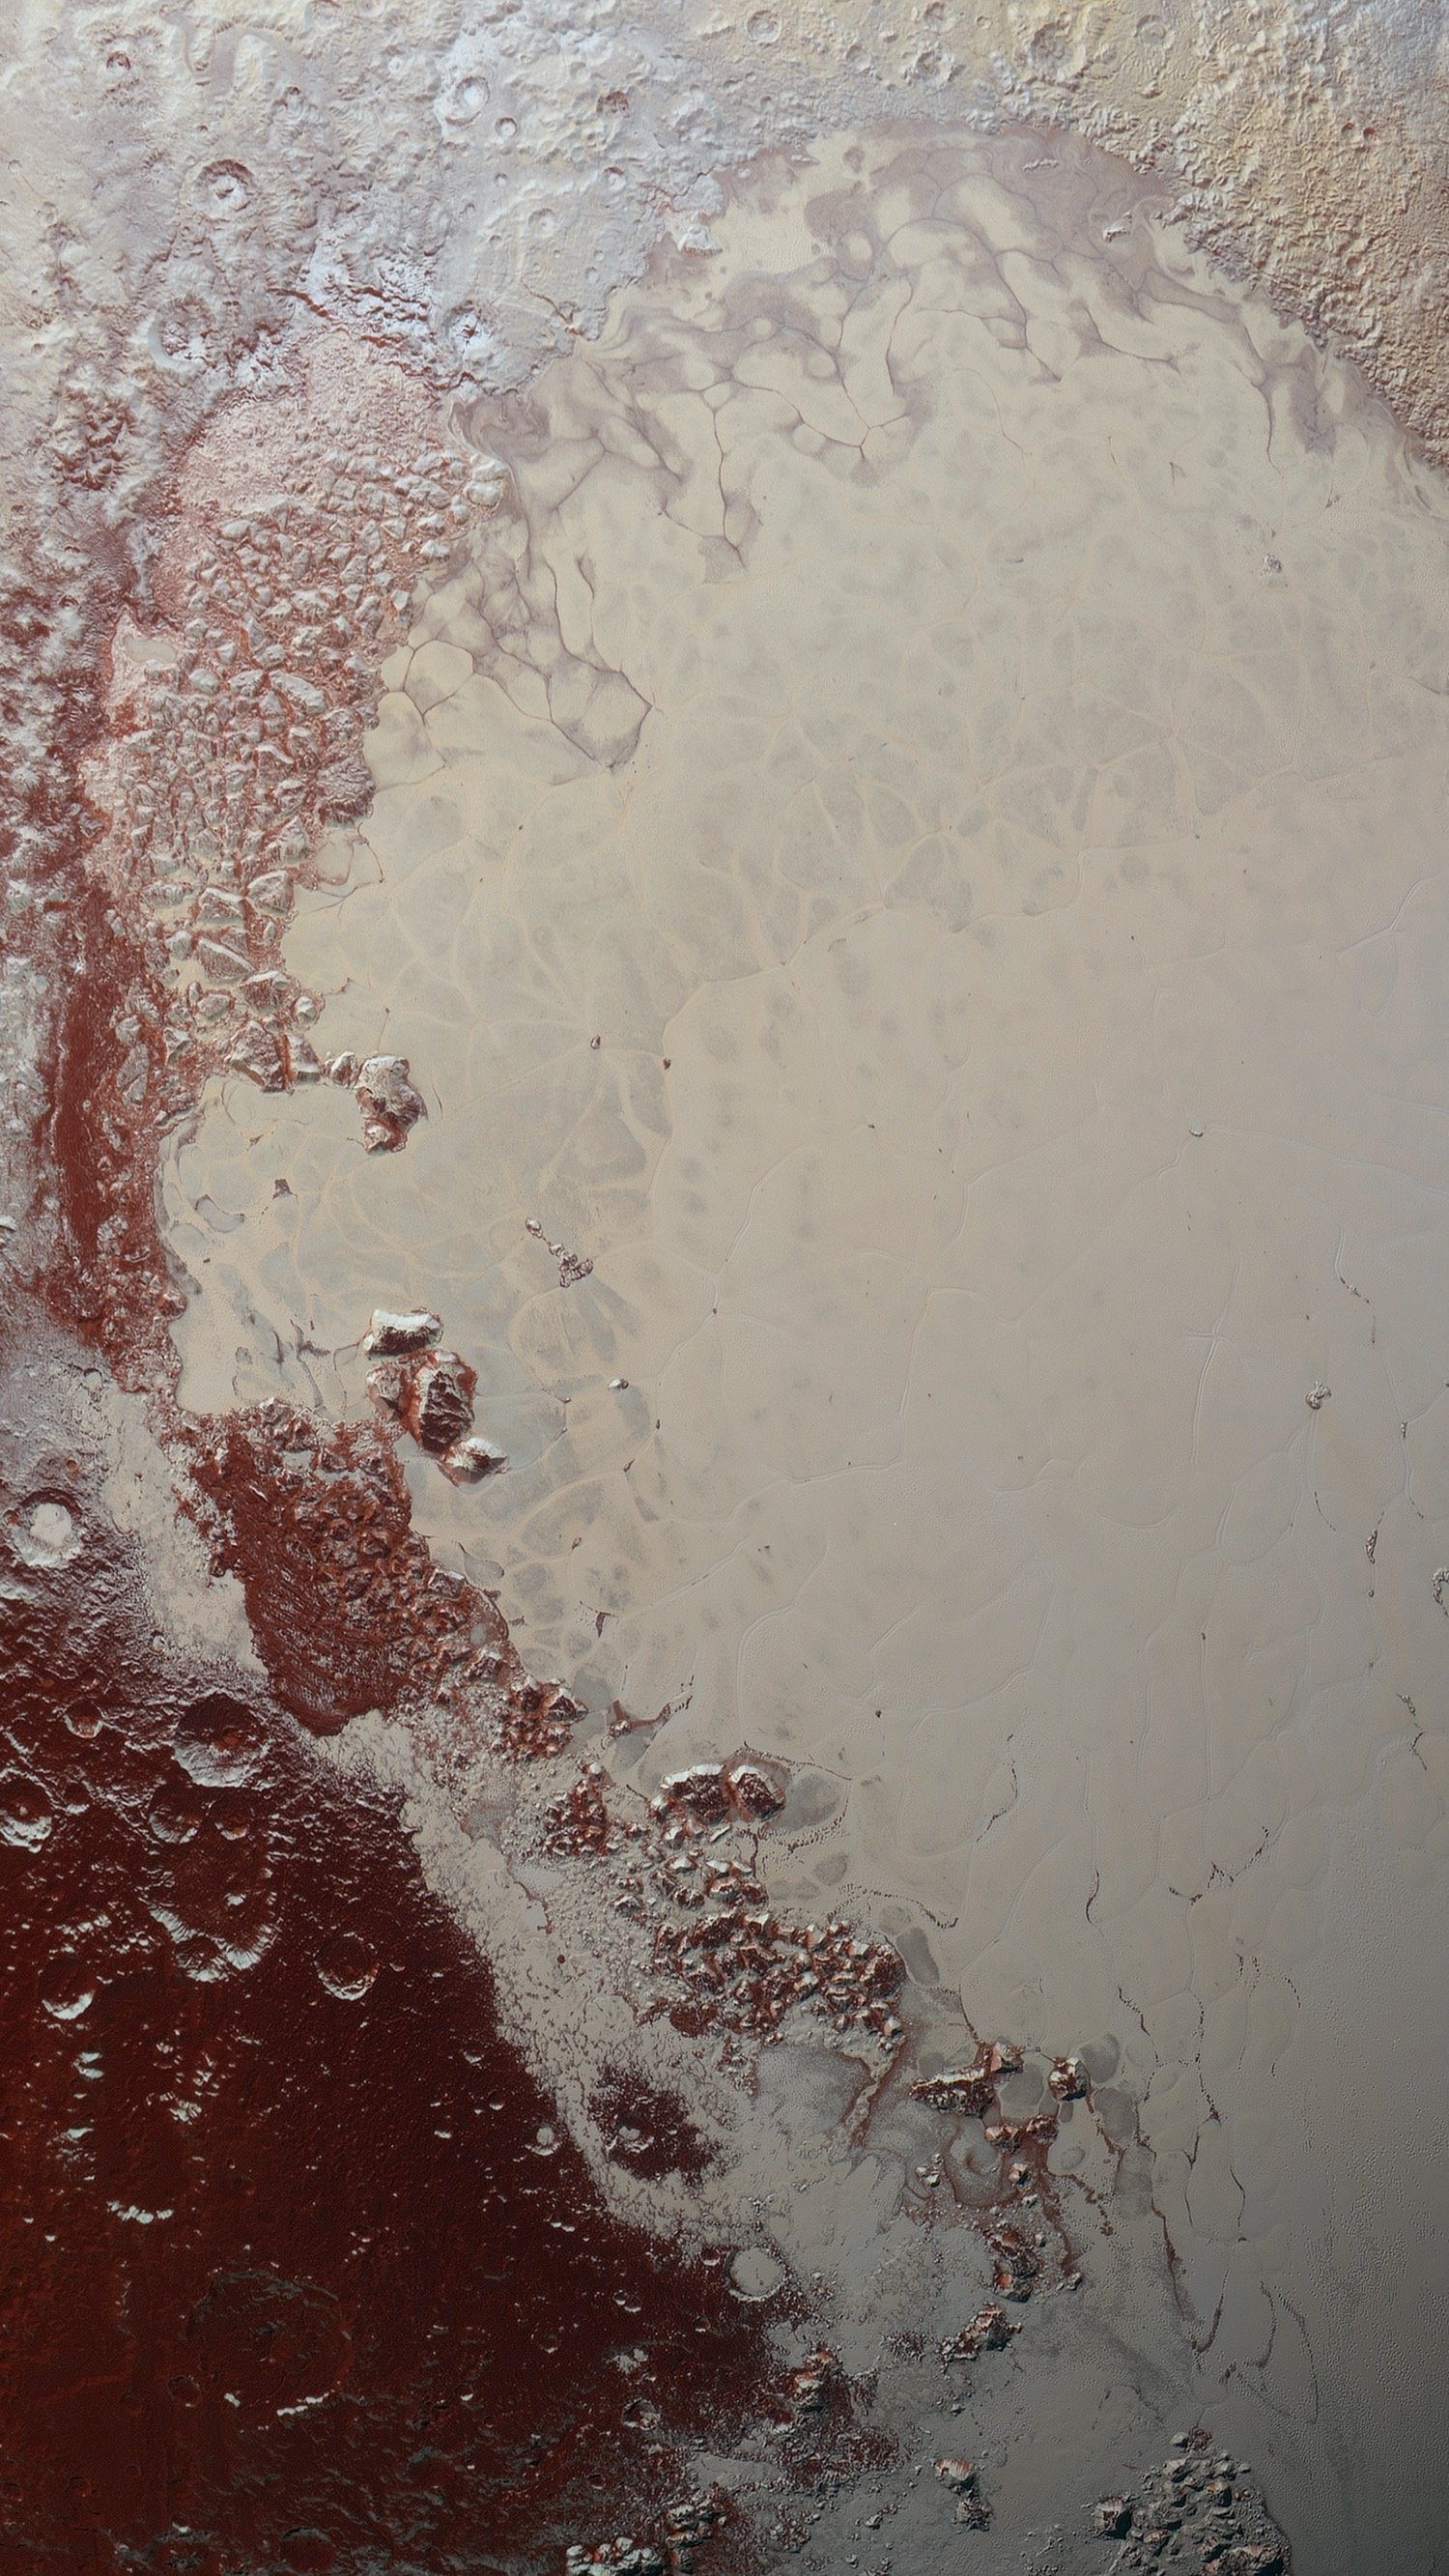 Cameron Nelms Pluto Wallpaper